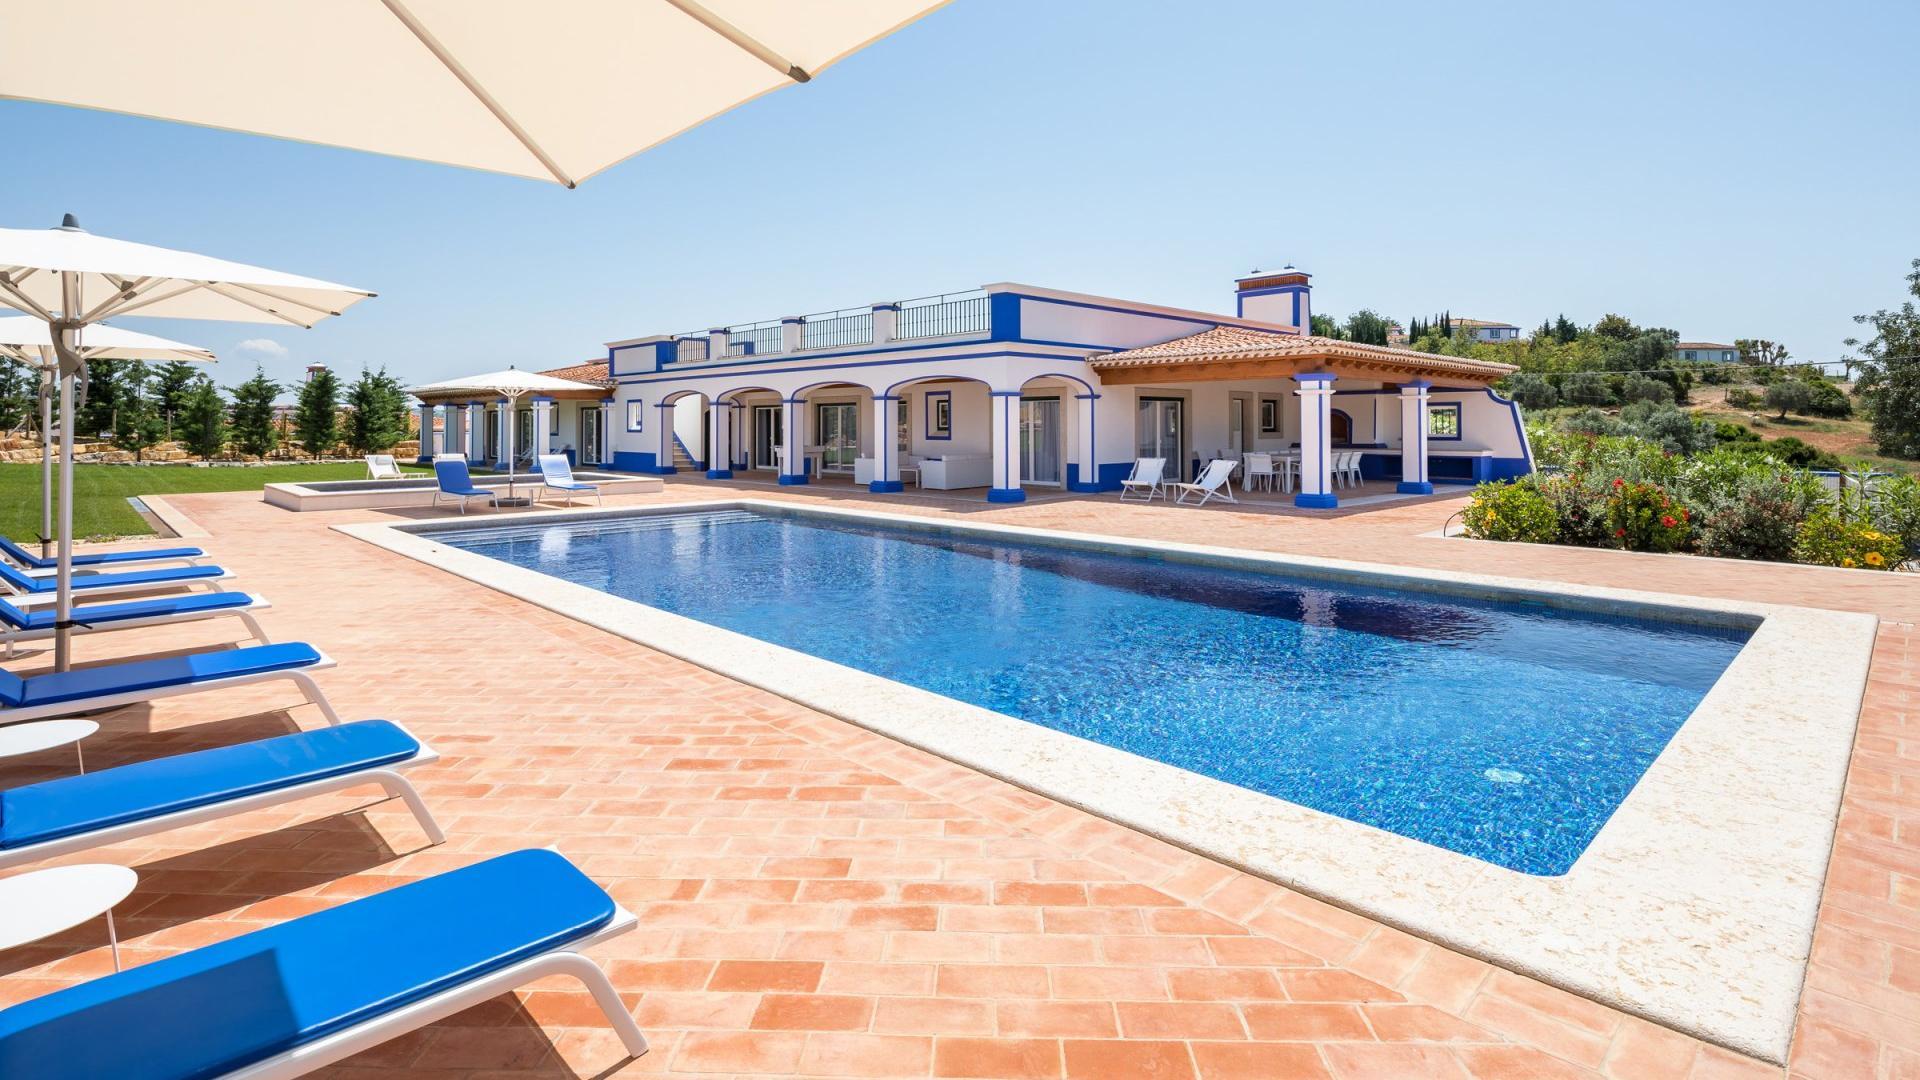 Villa Moana - Boliqueime, Algarve - _55A7639-HDR.jpg